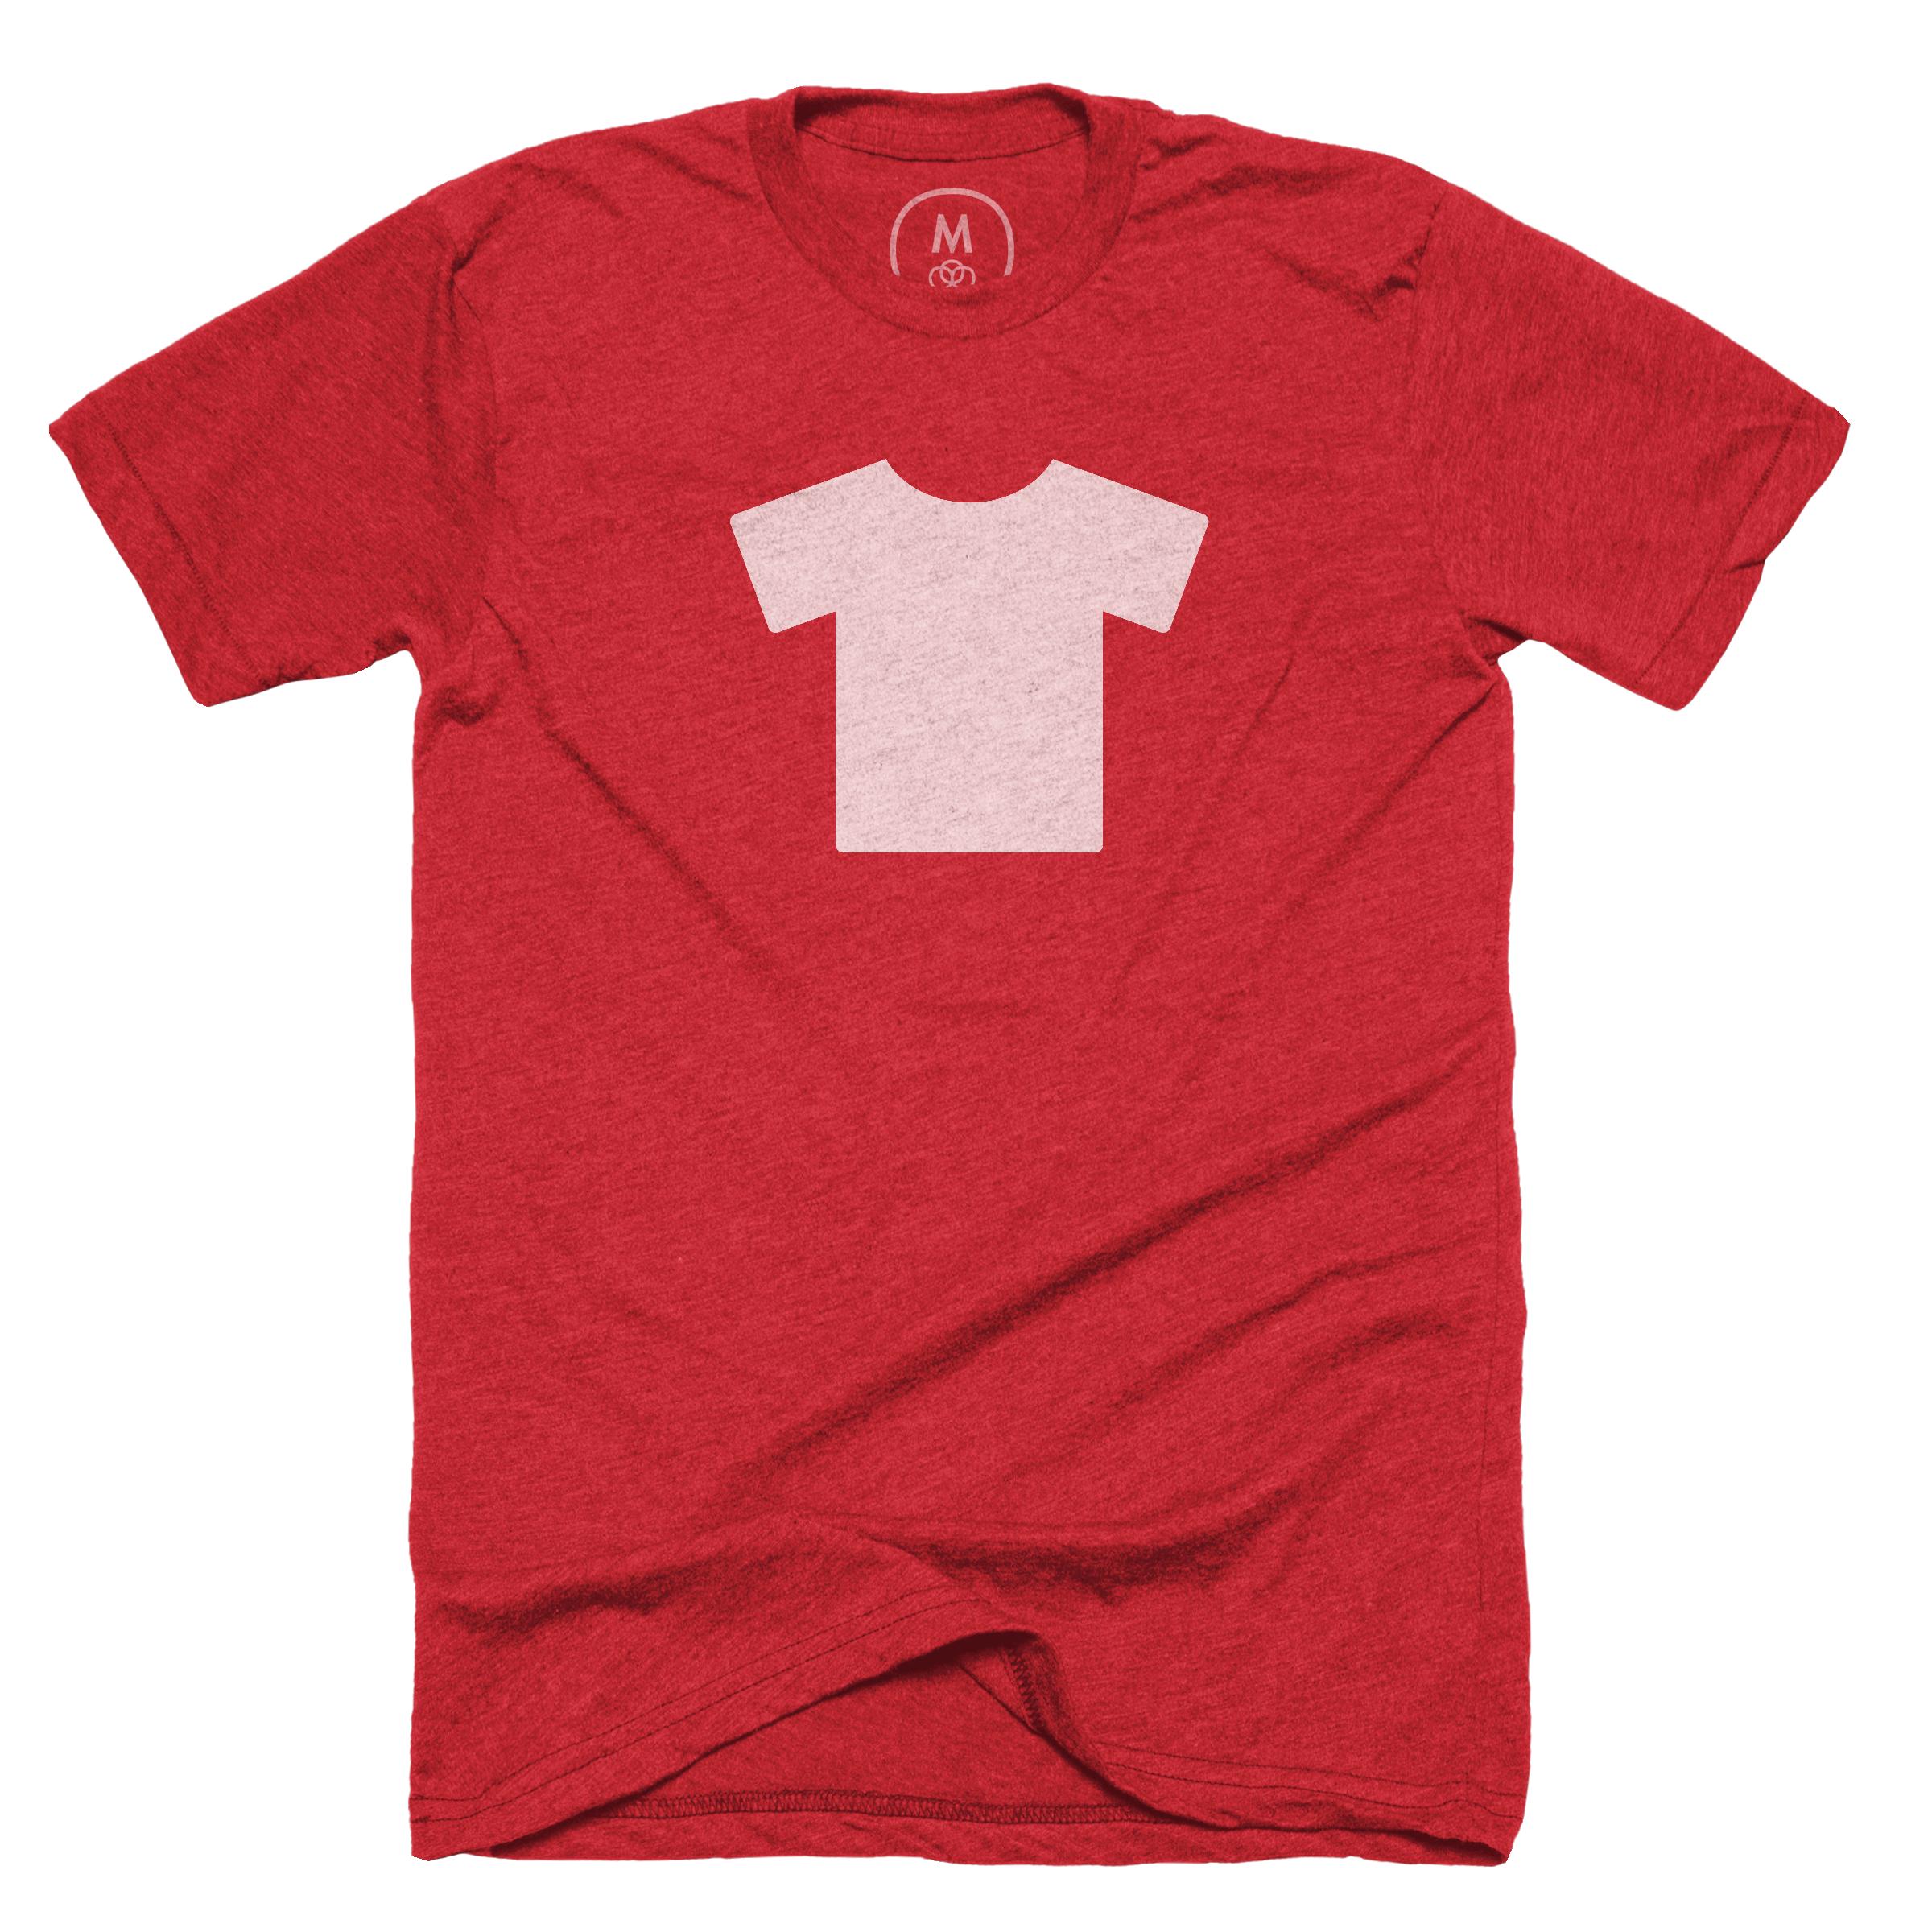 T-Shirt Red (Men's)